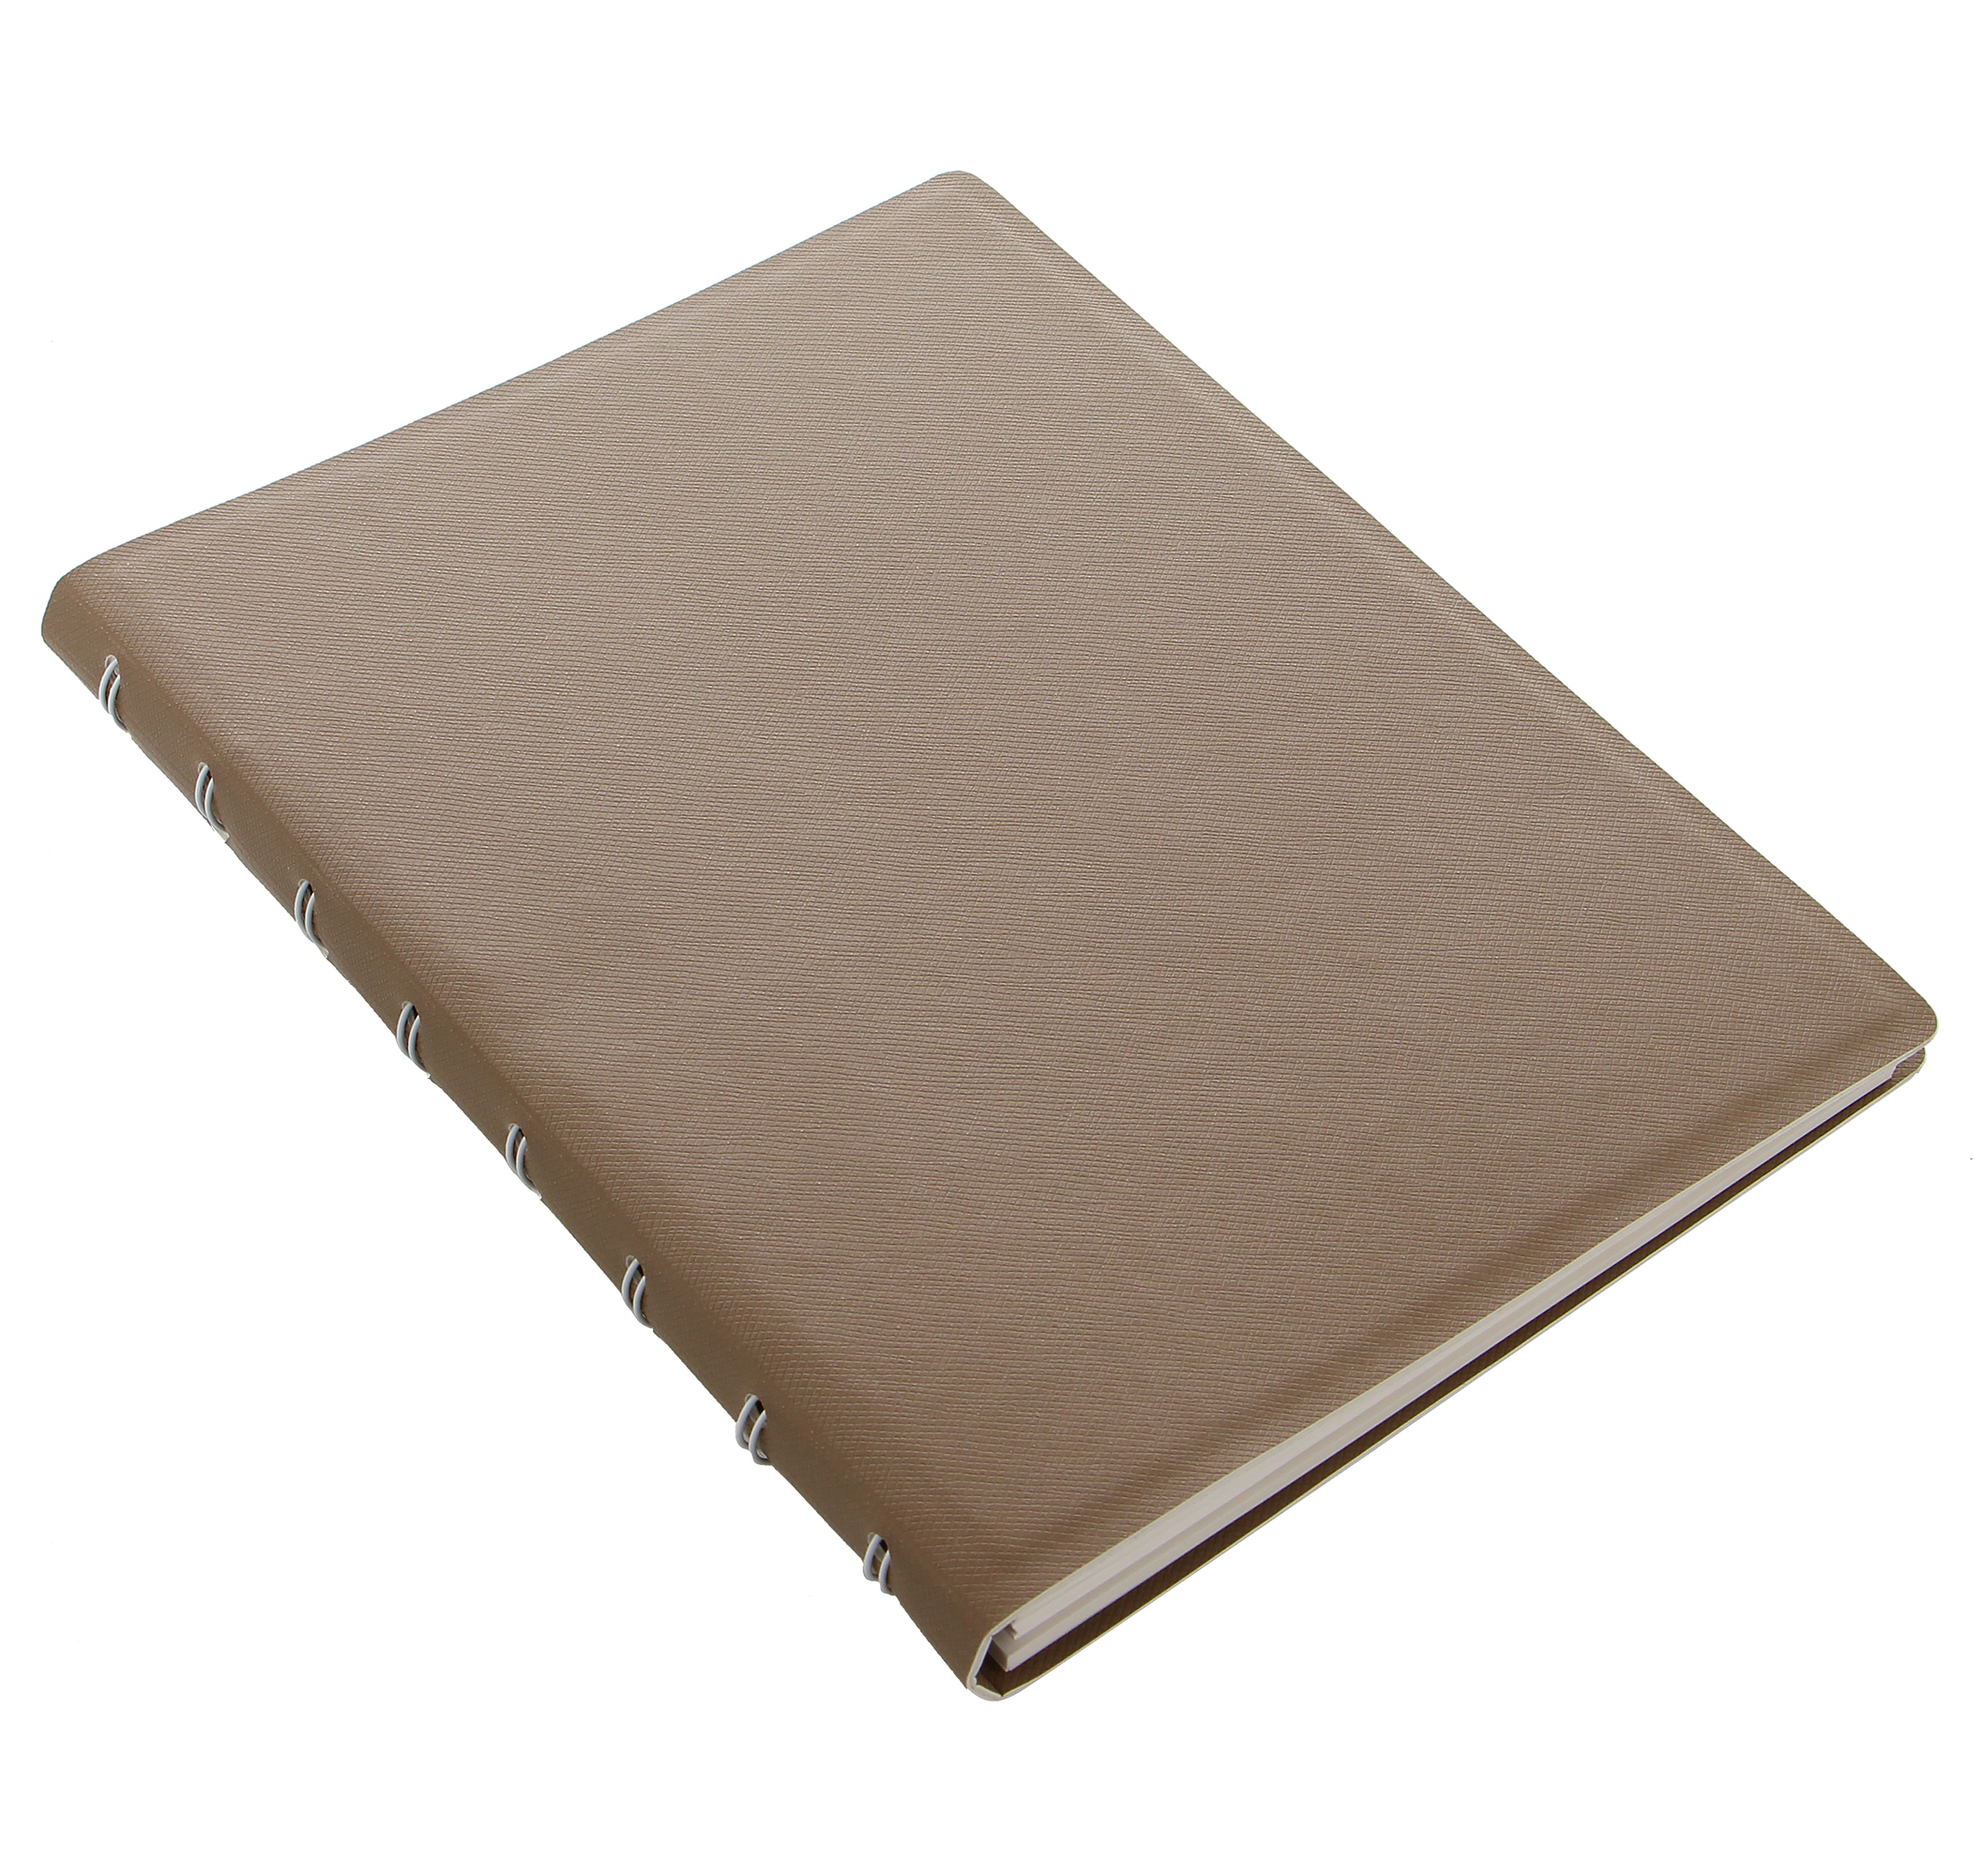 Filofax Notebook Saffiano A5 Schwarz Notizbuch Kunstleder nachfüllbar 115032